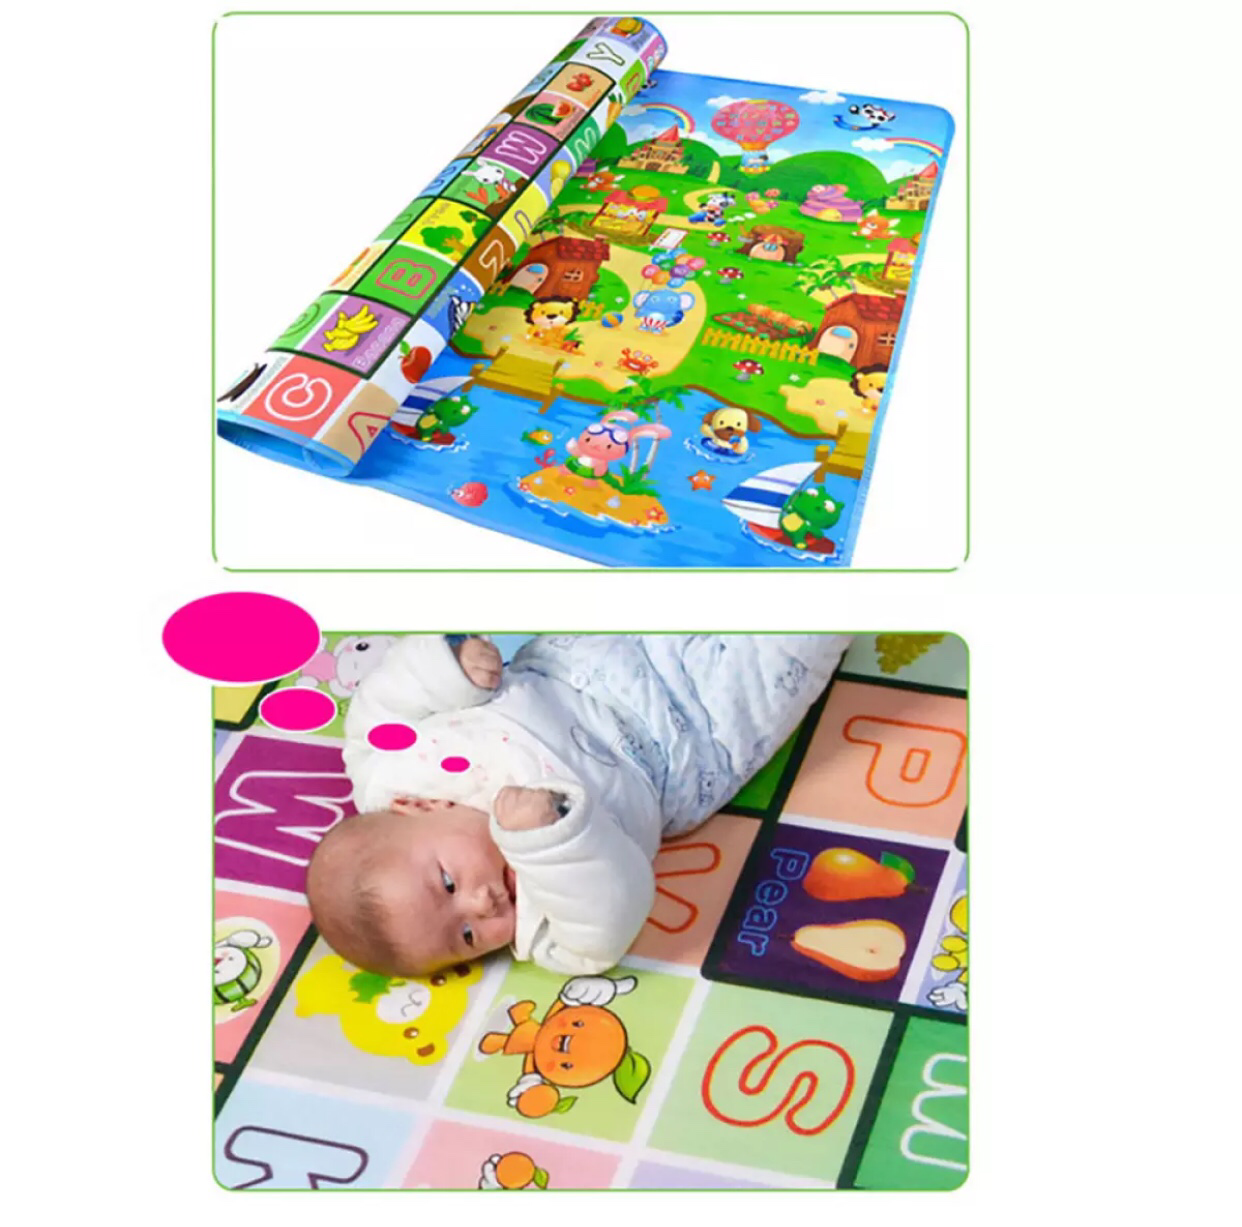 Large Activity Baby Play Mat (2m*1,8m) 00057